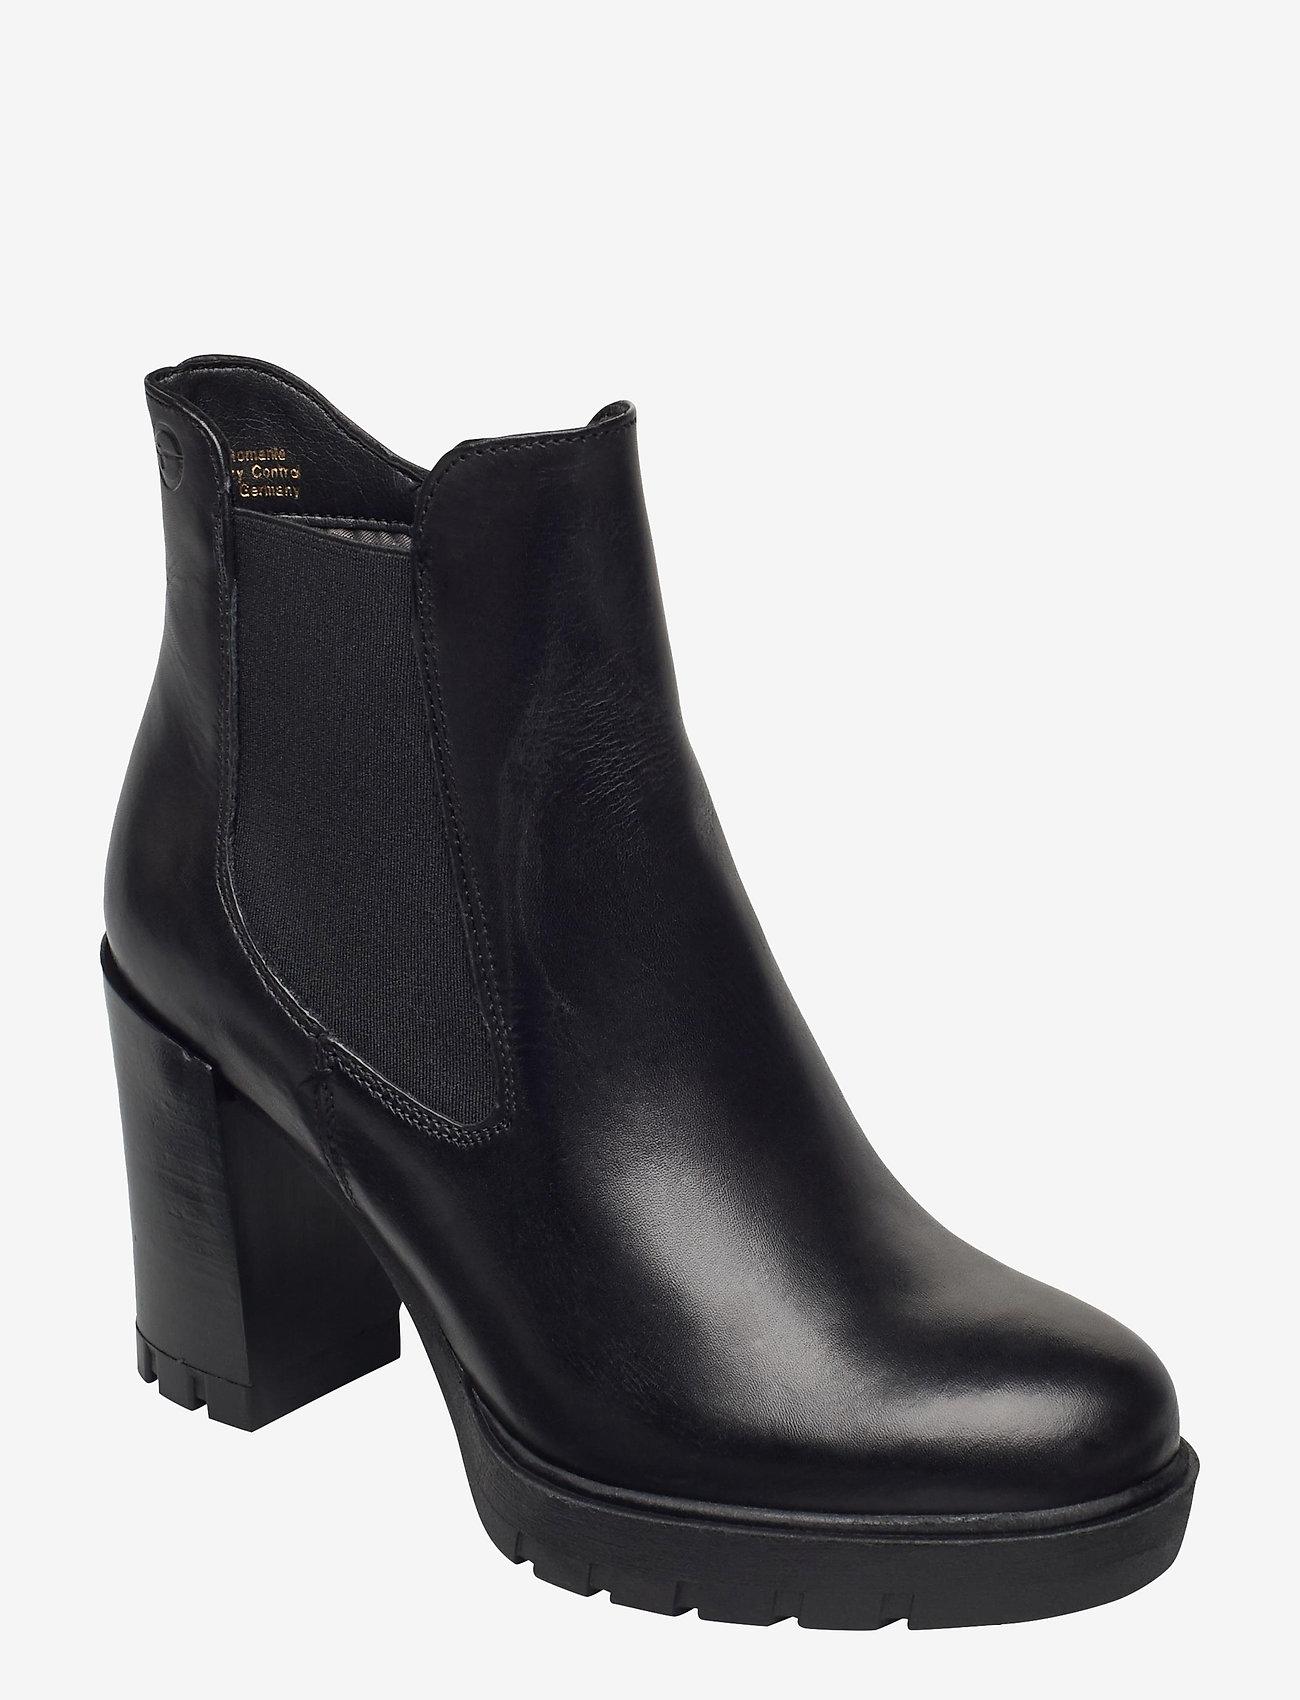 Tamaris - Woms Boots - enkellaarsjes met hak - black - 0